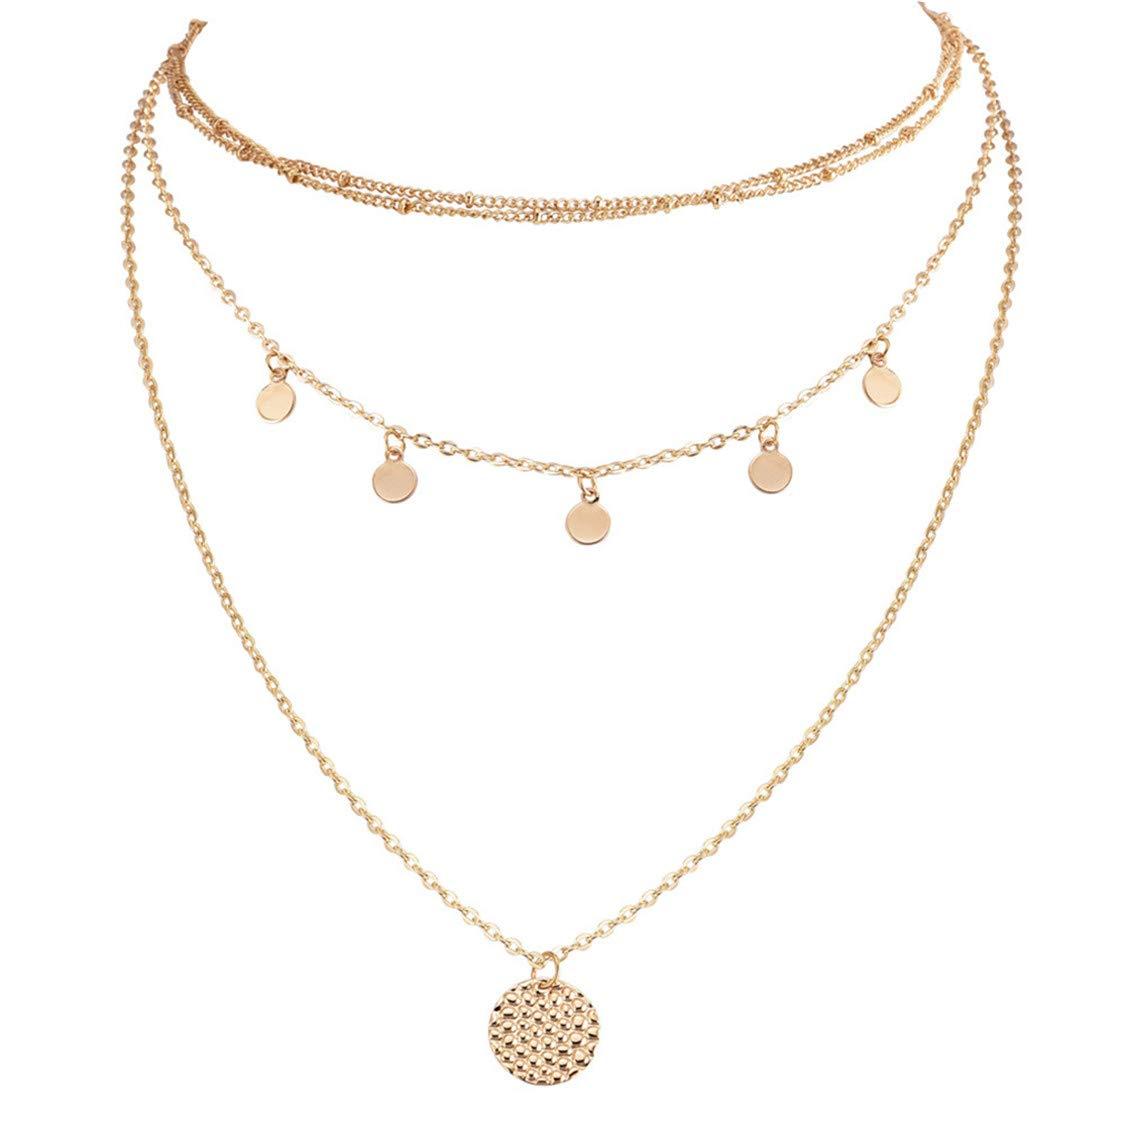 Choker Necklace Women Charm Choker Necklace Evening Party Banquet Jewellery